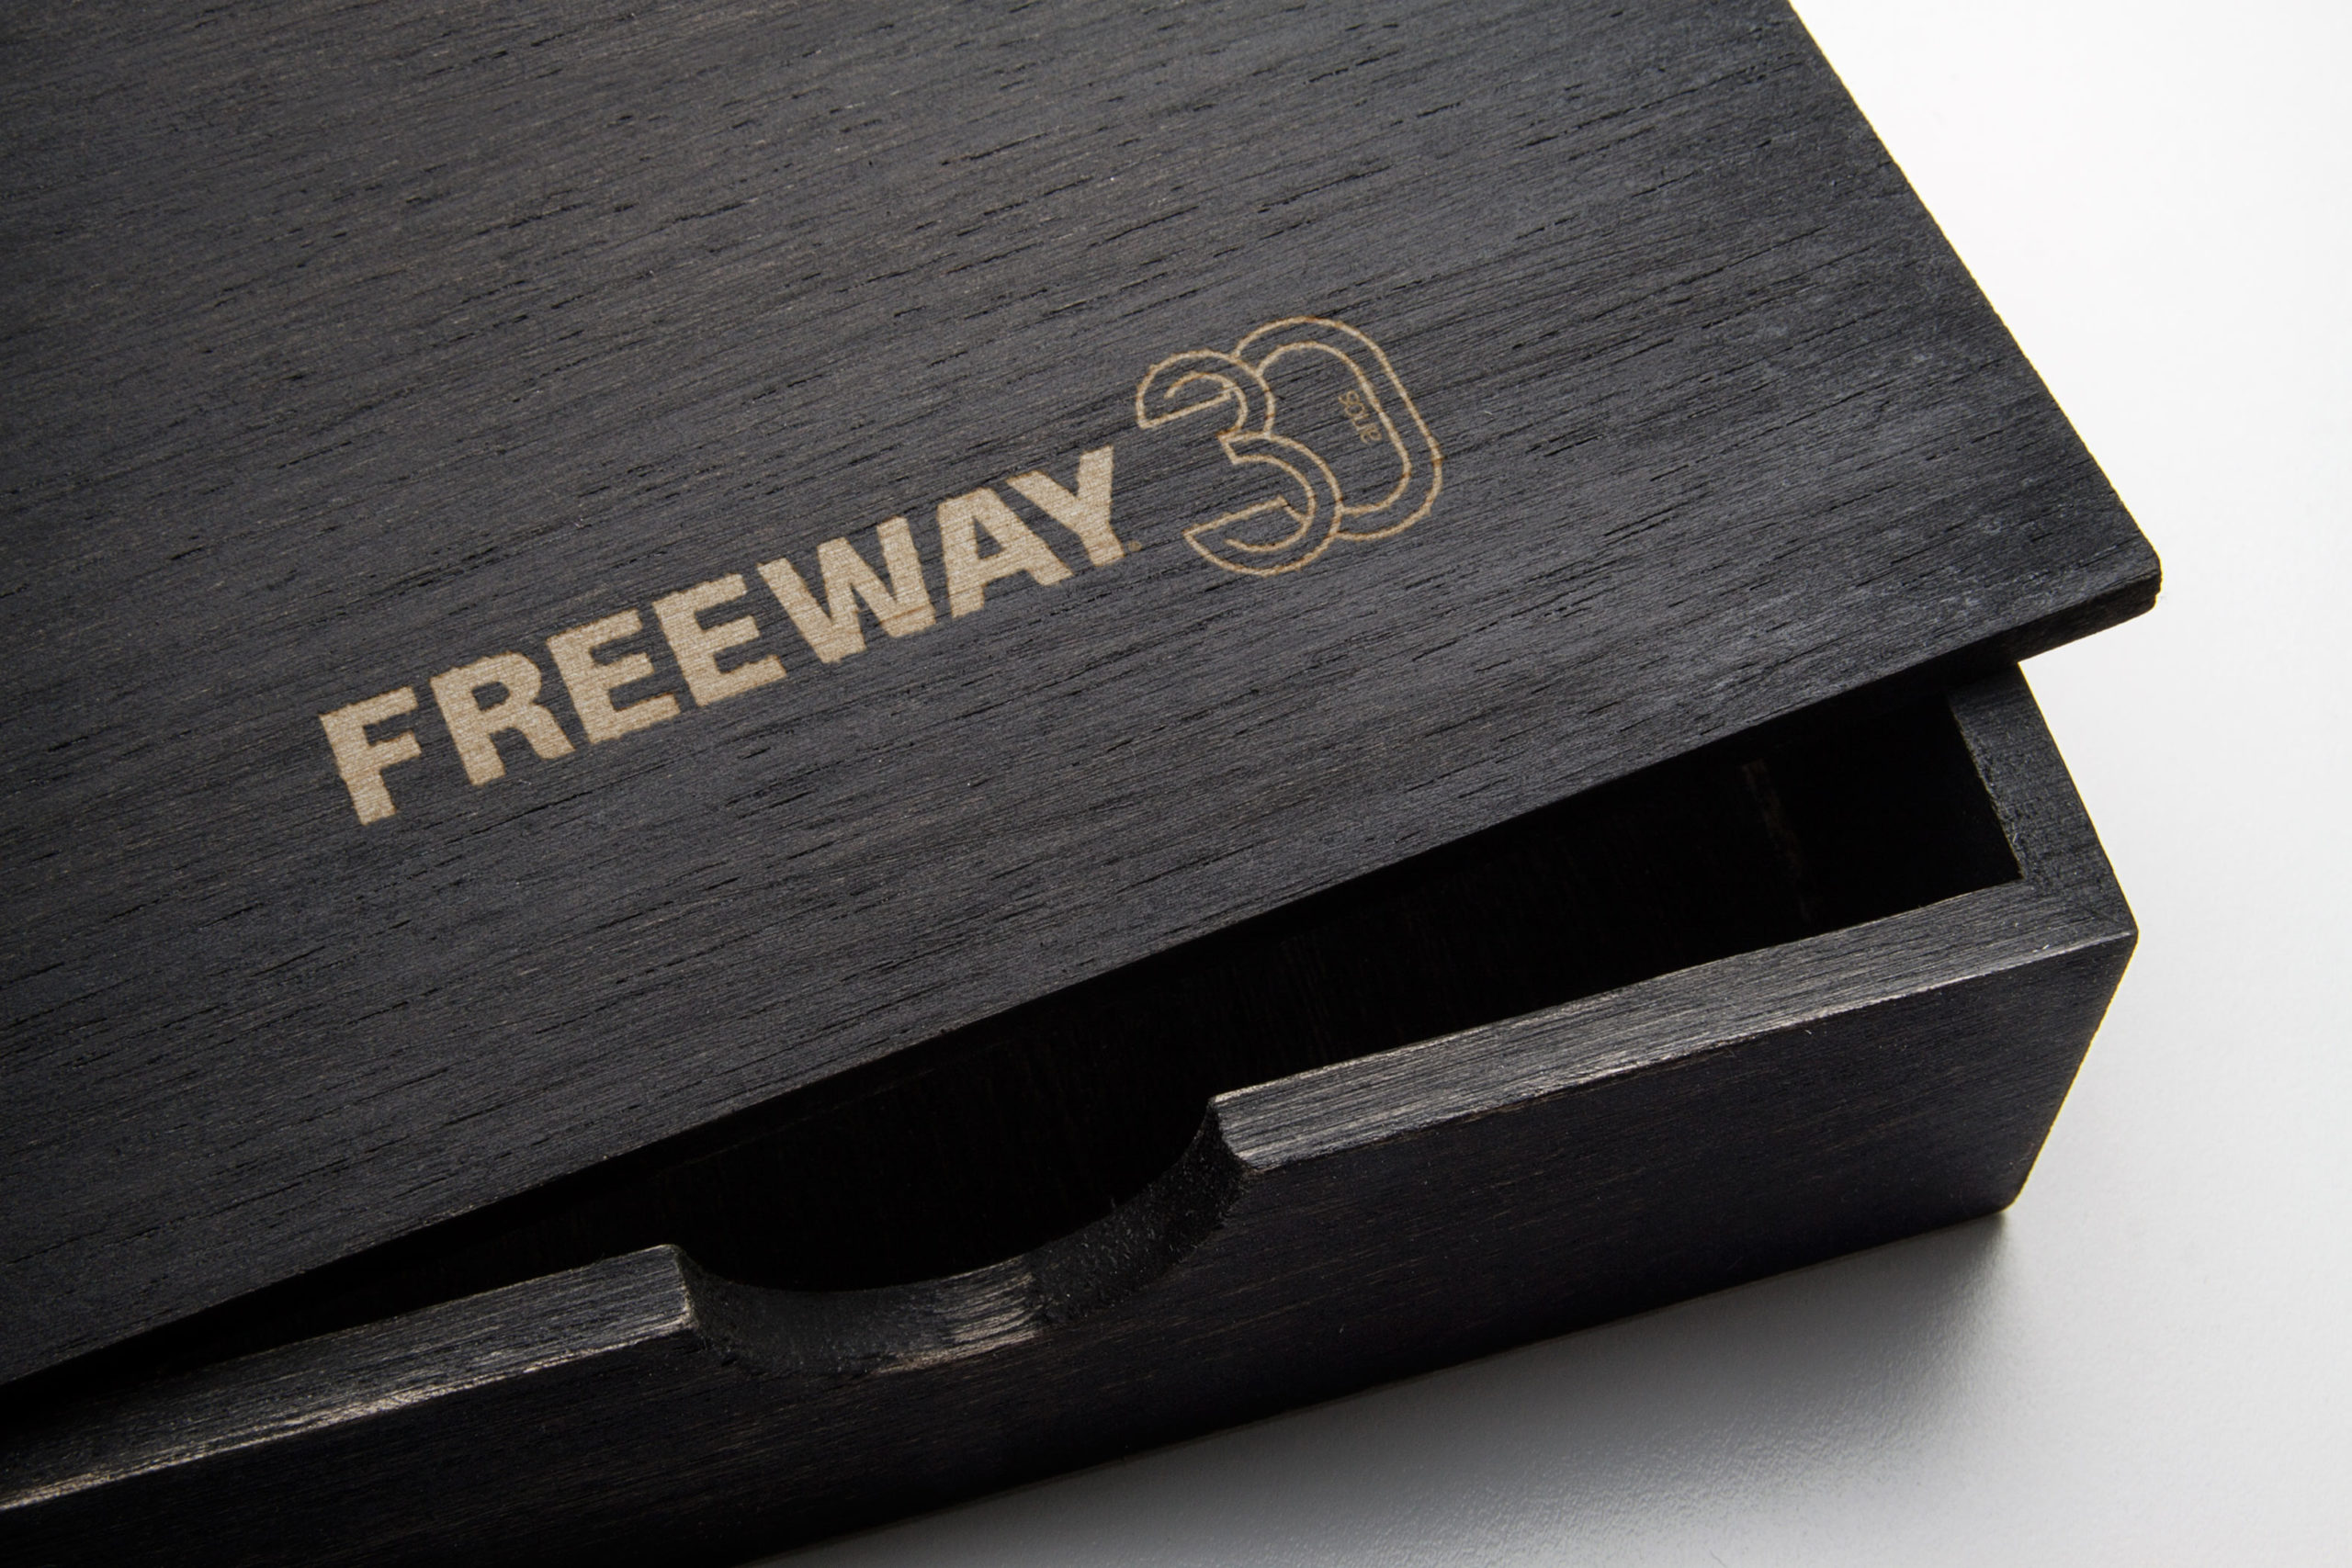 30anos_freeway